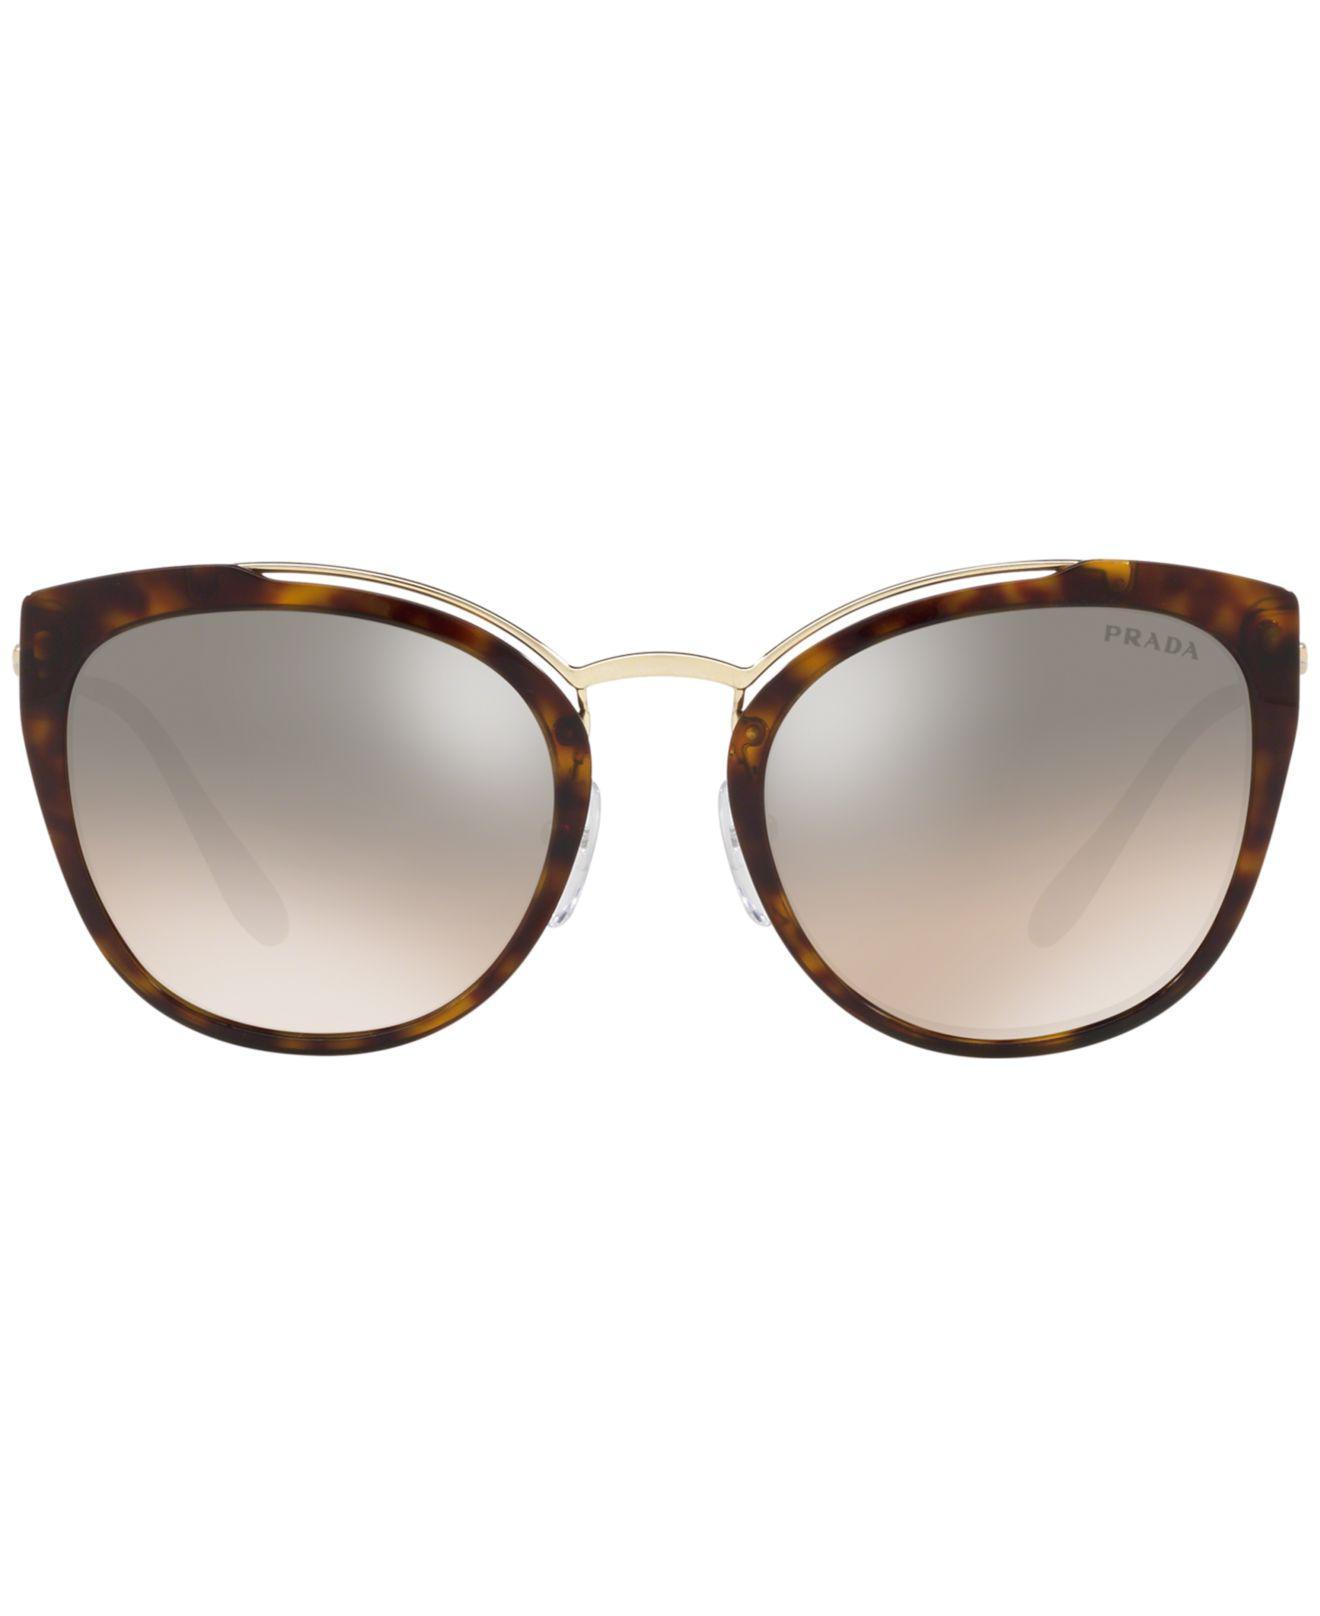 23cb70b1d3e8f ... cheap lyst prada sunglasses pr 20us 54 b77ac 73b0e